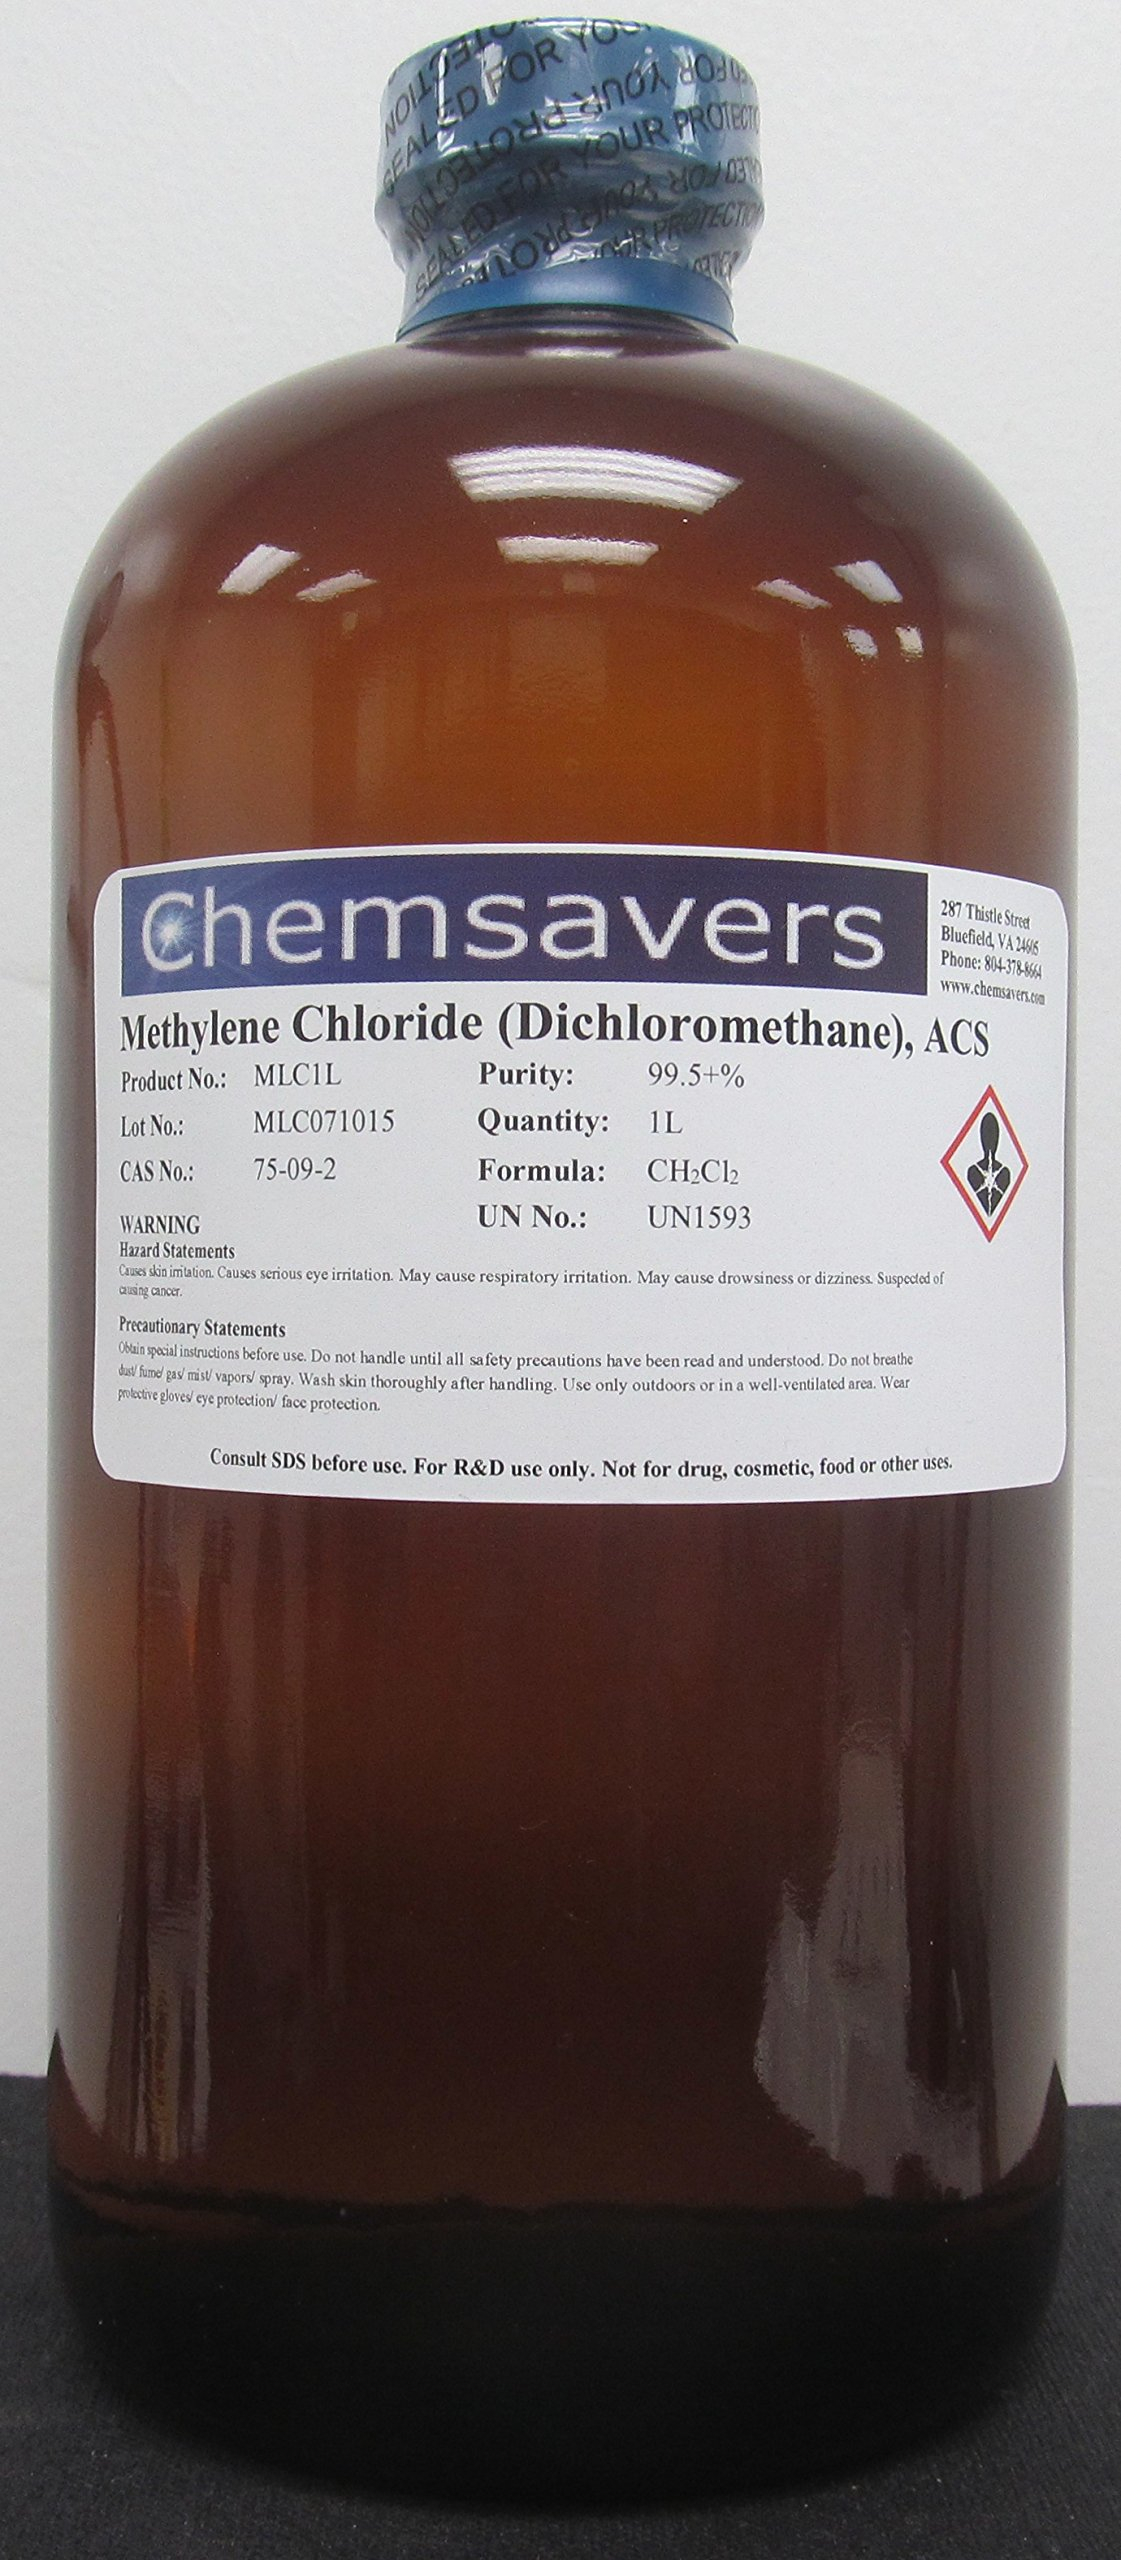 Methylene Chloride (Dichloromethane), ACS, 99.5+%, 1L (32oz)